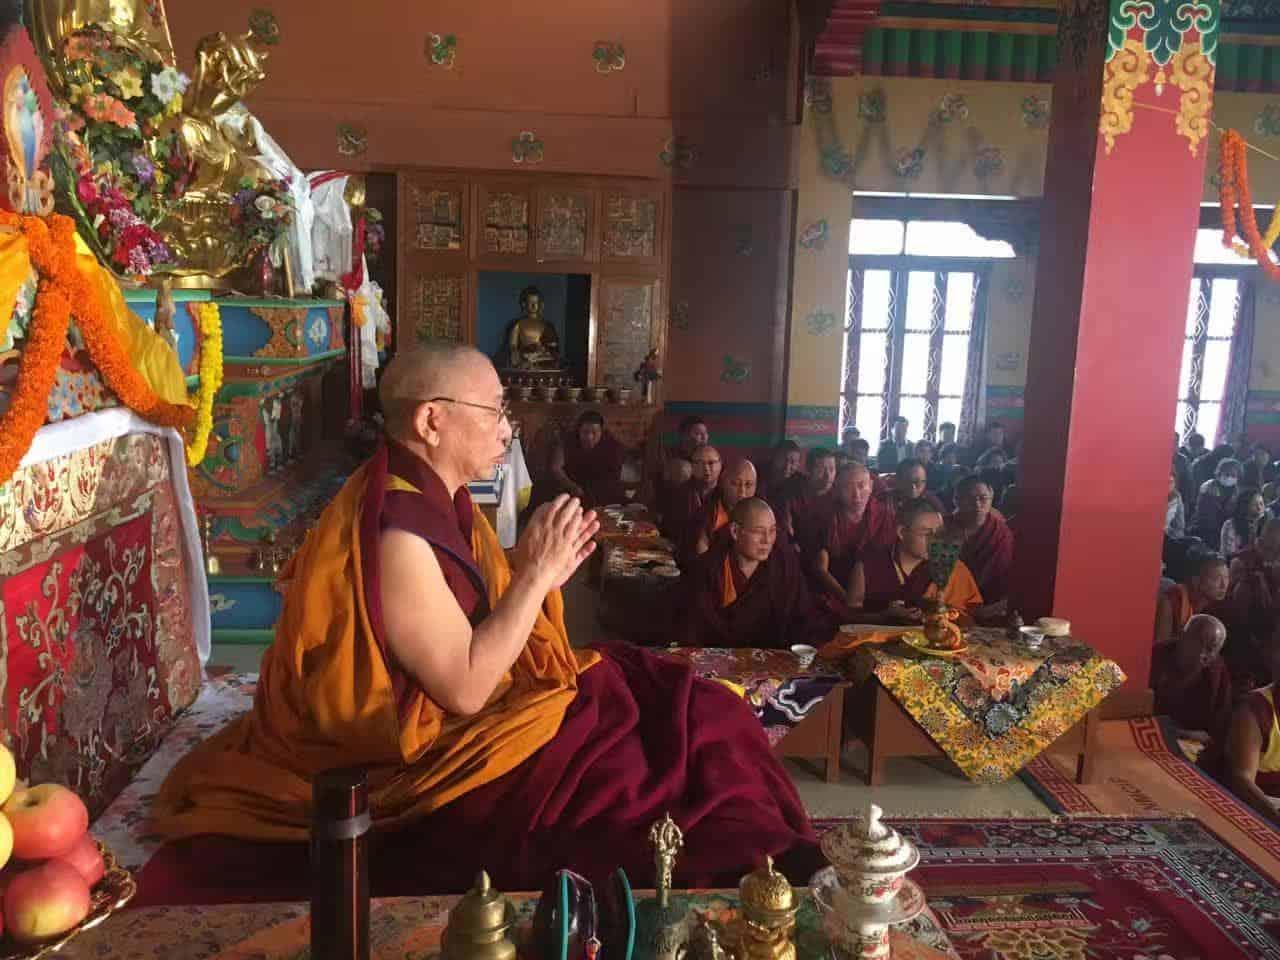 Gosok Rinpoche India 2017 longlife be0599c1e79499c76c630da9f54a5c2